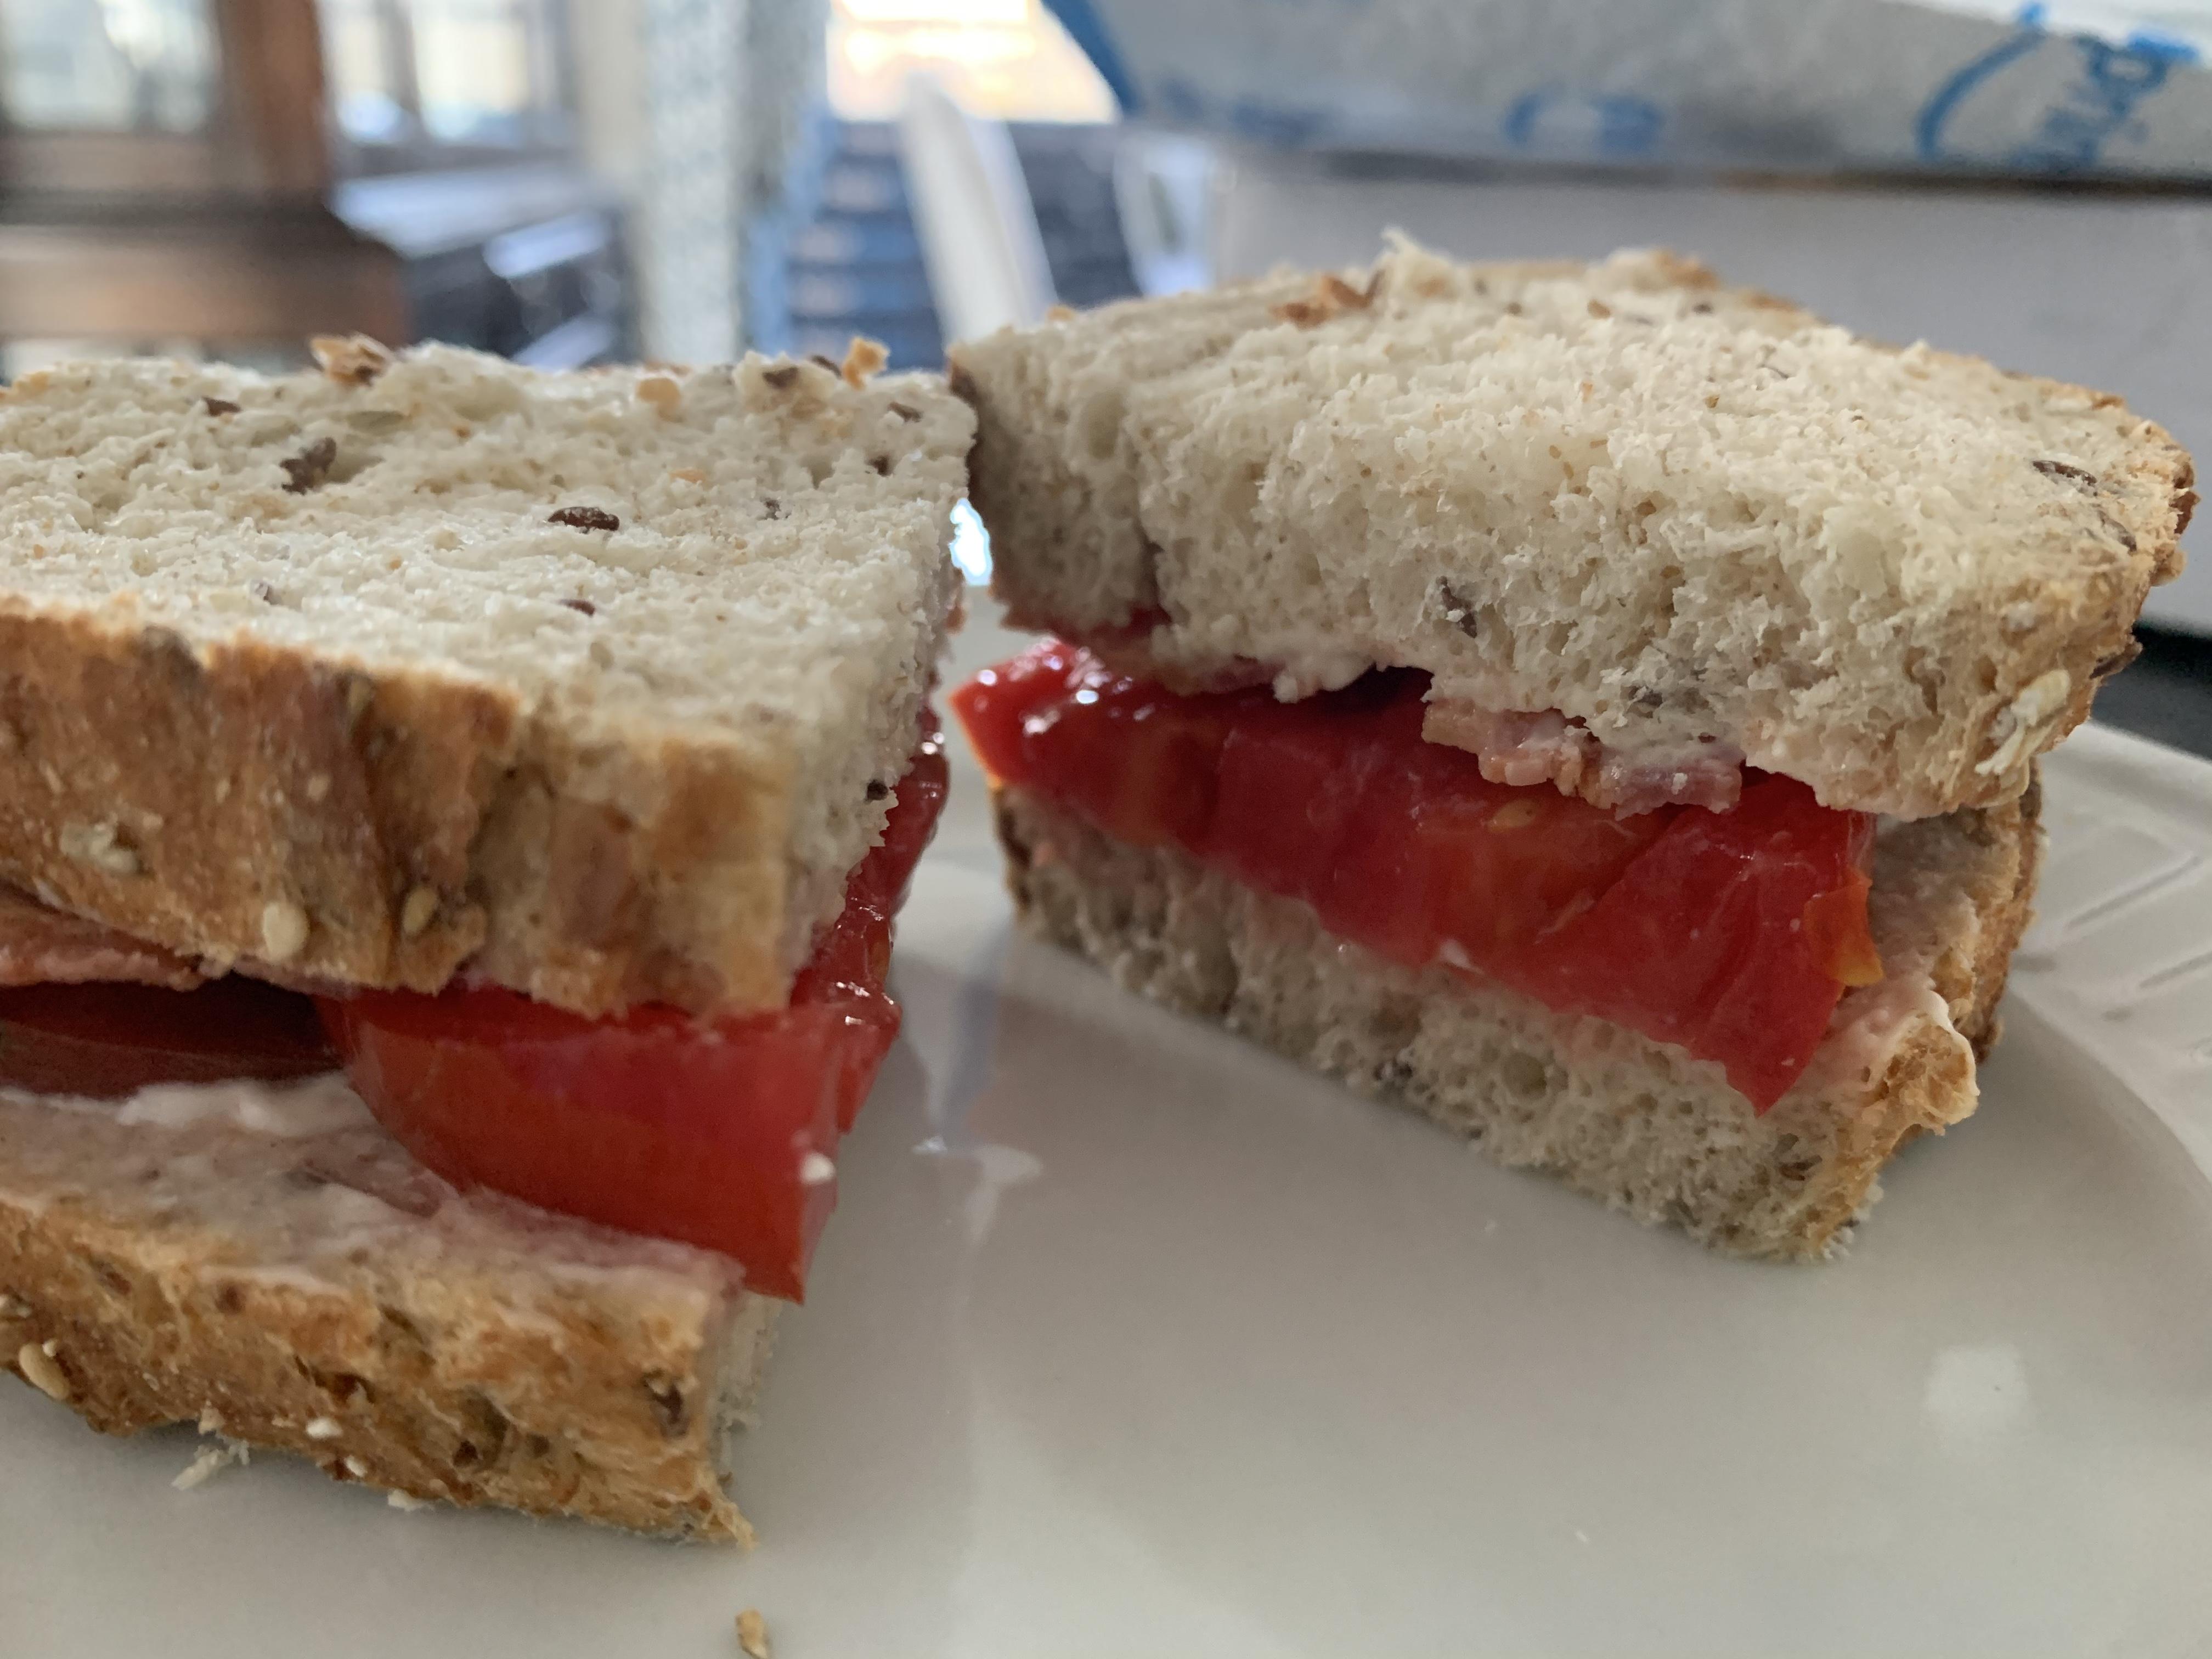 512EF43F 9E94 41FF BB95 1F2BD14394B5 Tomato sandwich